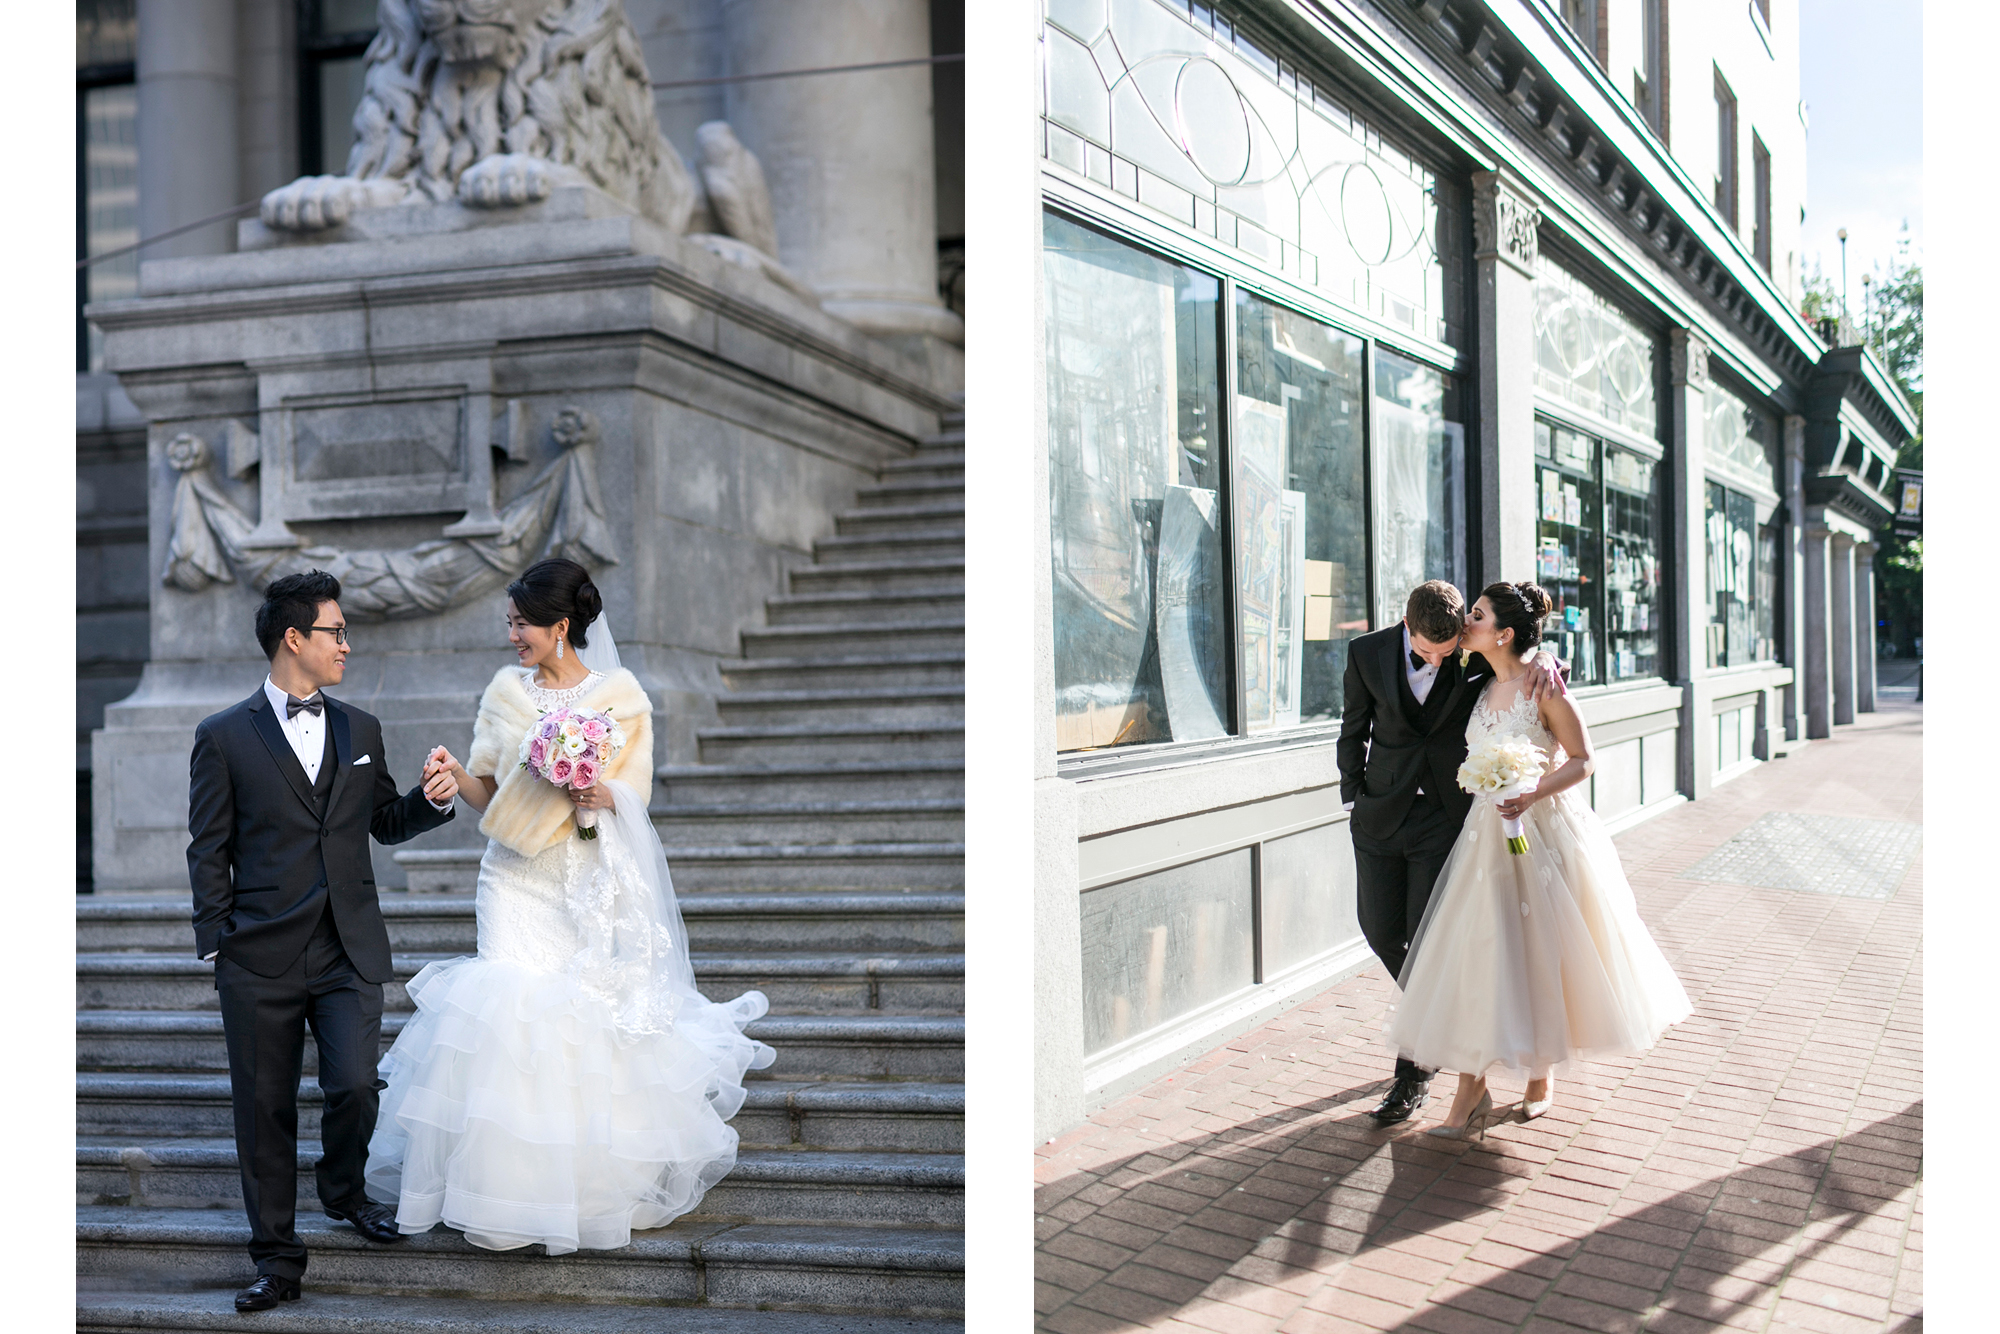 vancouver-luxury-wedding-photographer-lori-miles-39.jpg